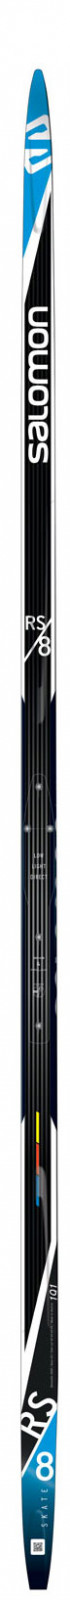 běžecké lyže Salomon RS 8 Extra Stiff